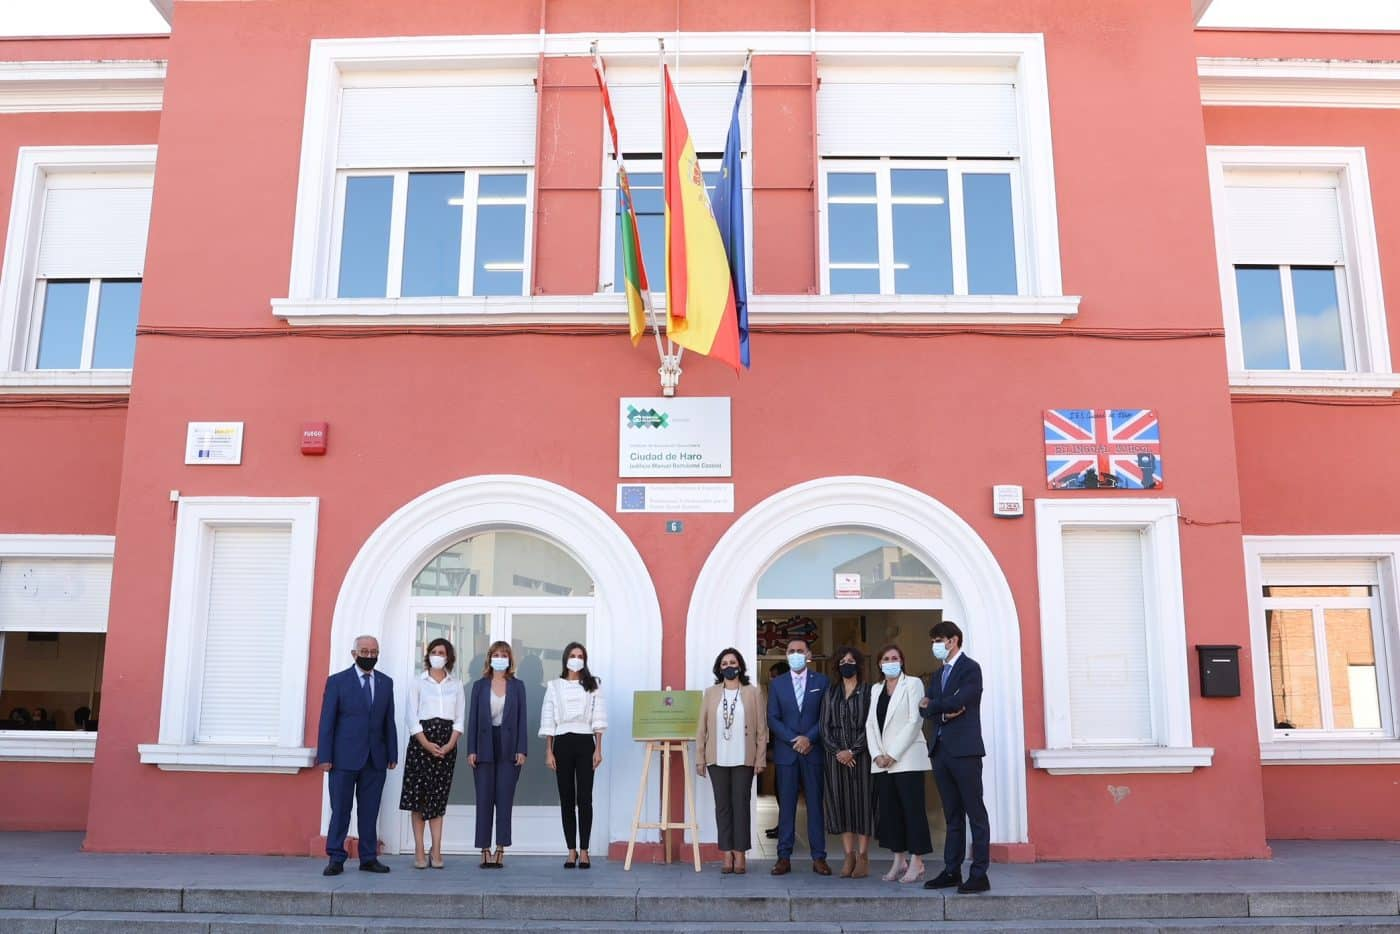 La reina Letizia preside en Haro la apertura del curso de FP 4